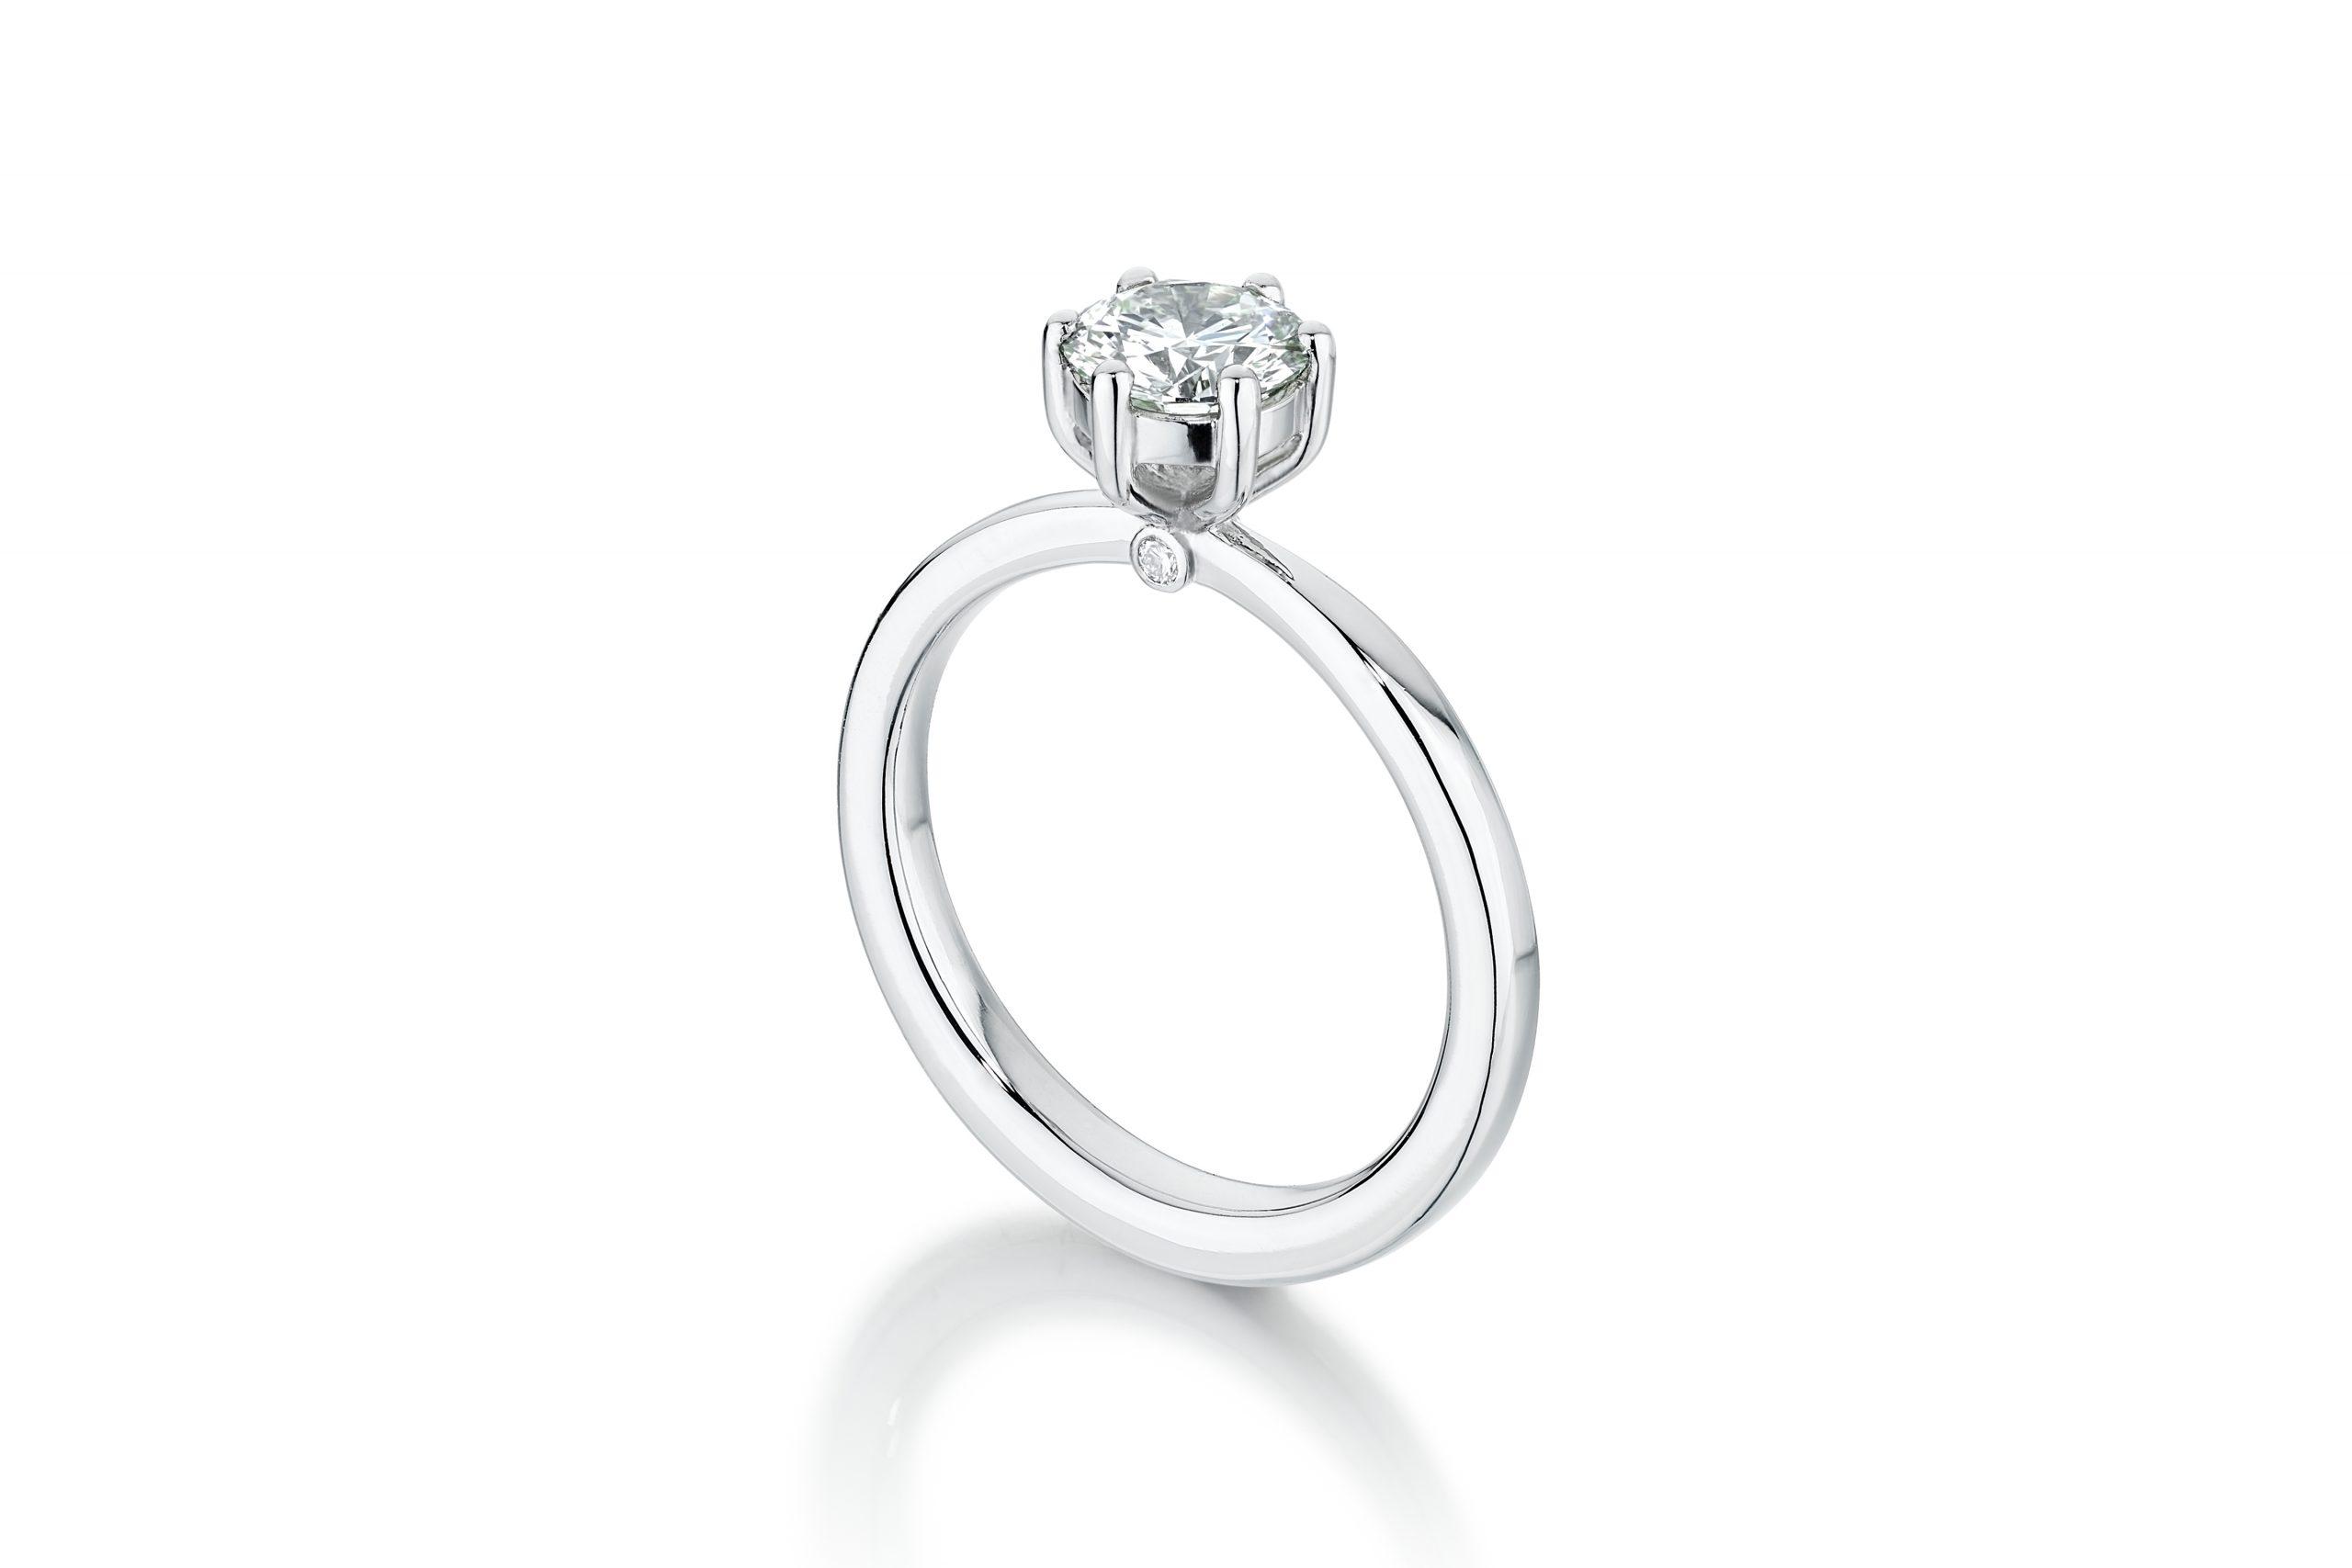 6 Claw Engagement Ring – Copyright BJRdesigns